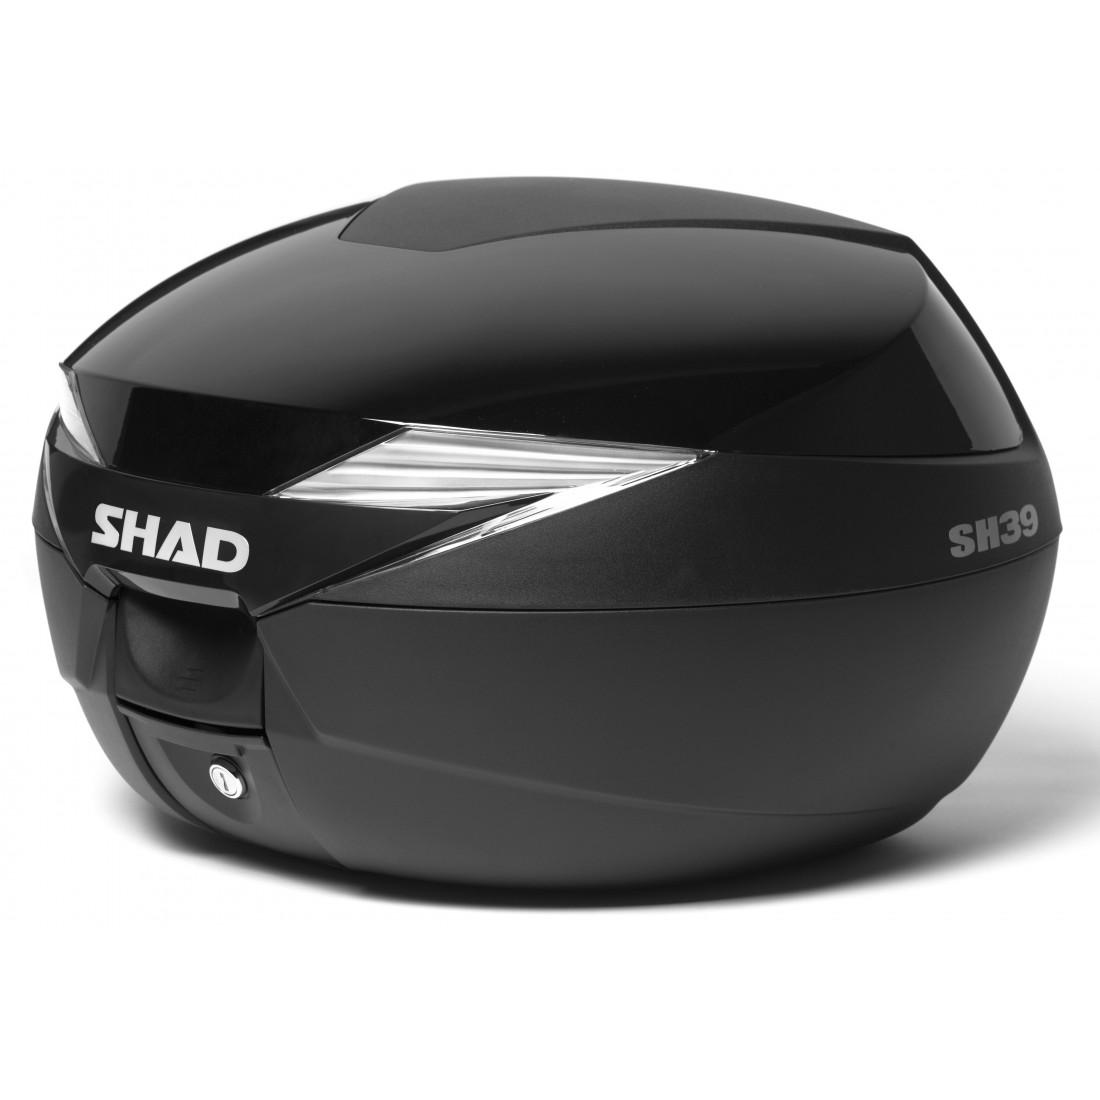 Tapa Baúl Shad SH39 39lt Negro Metal